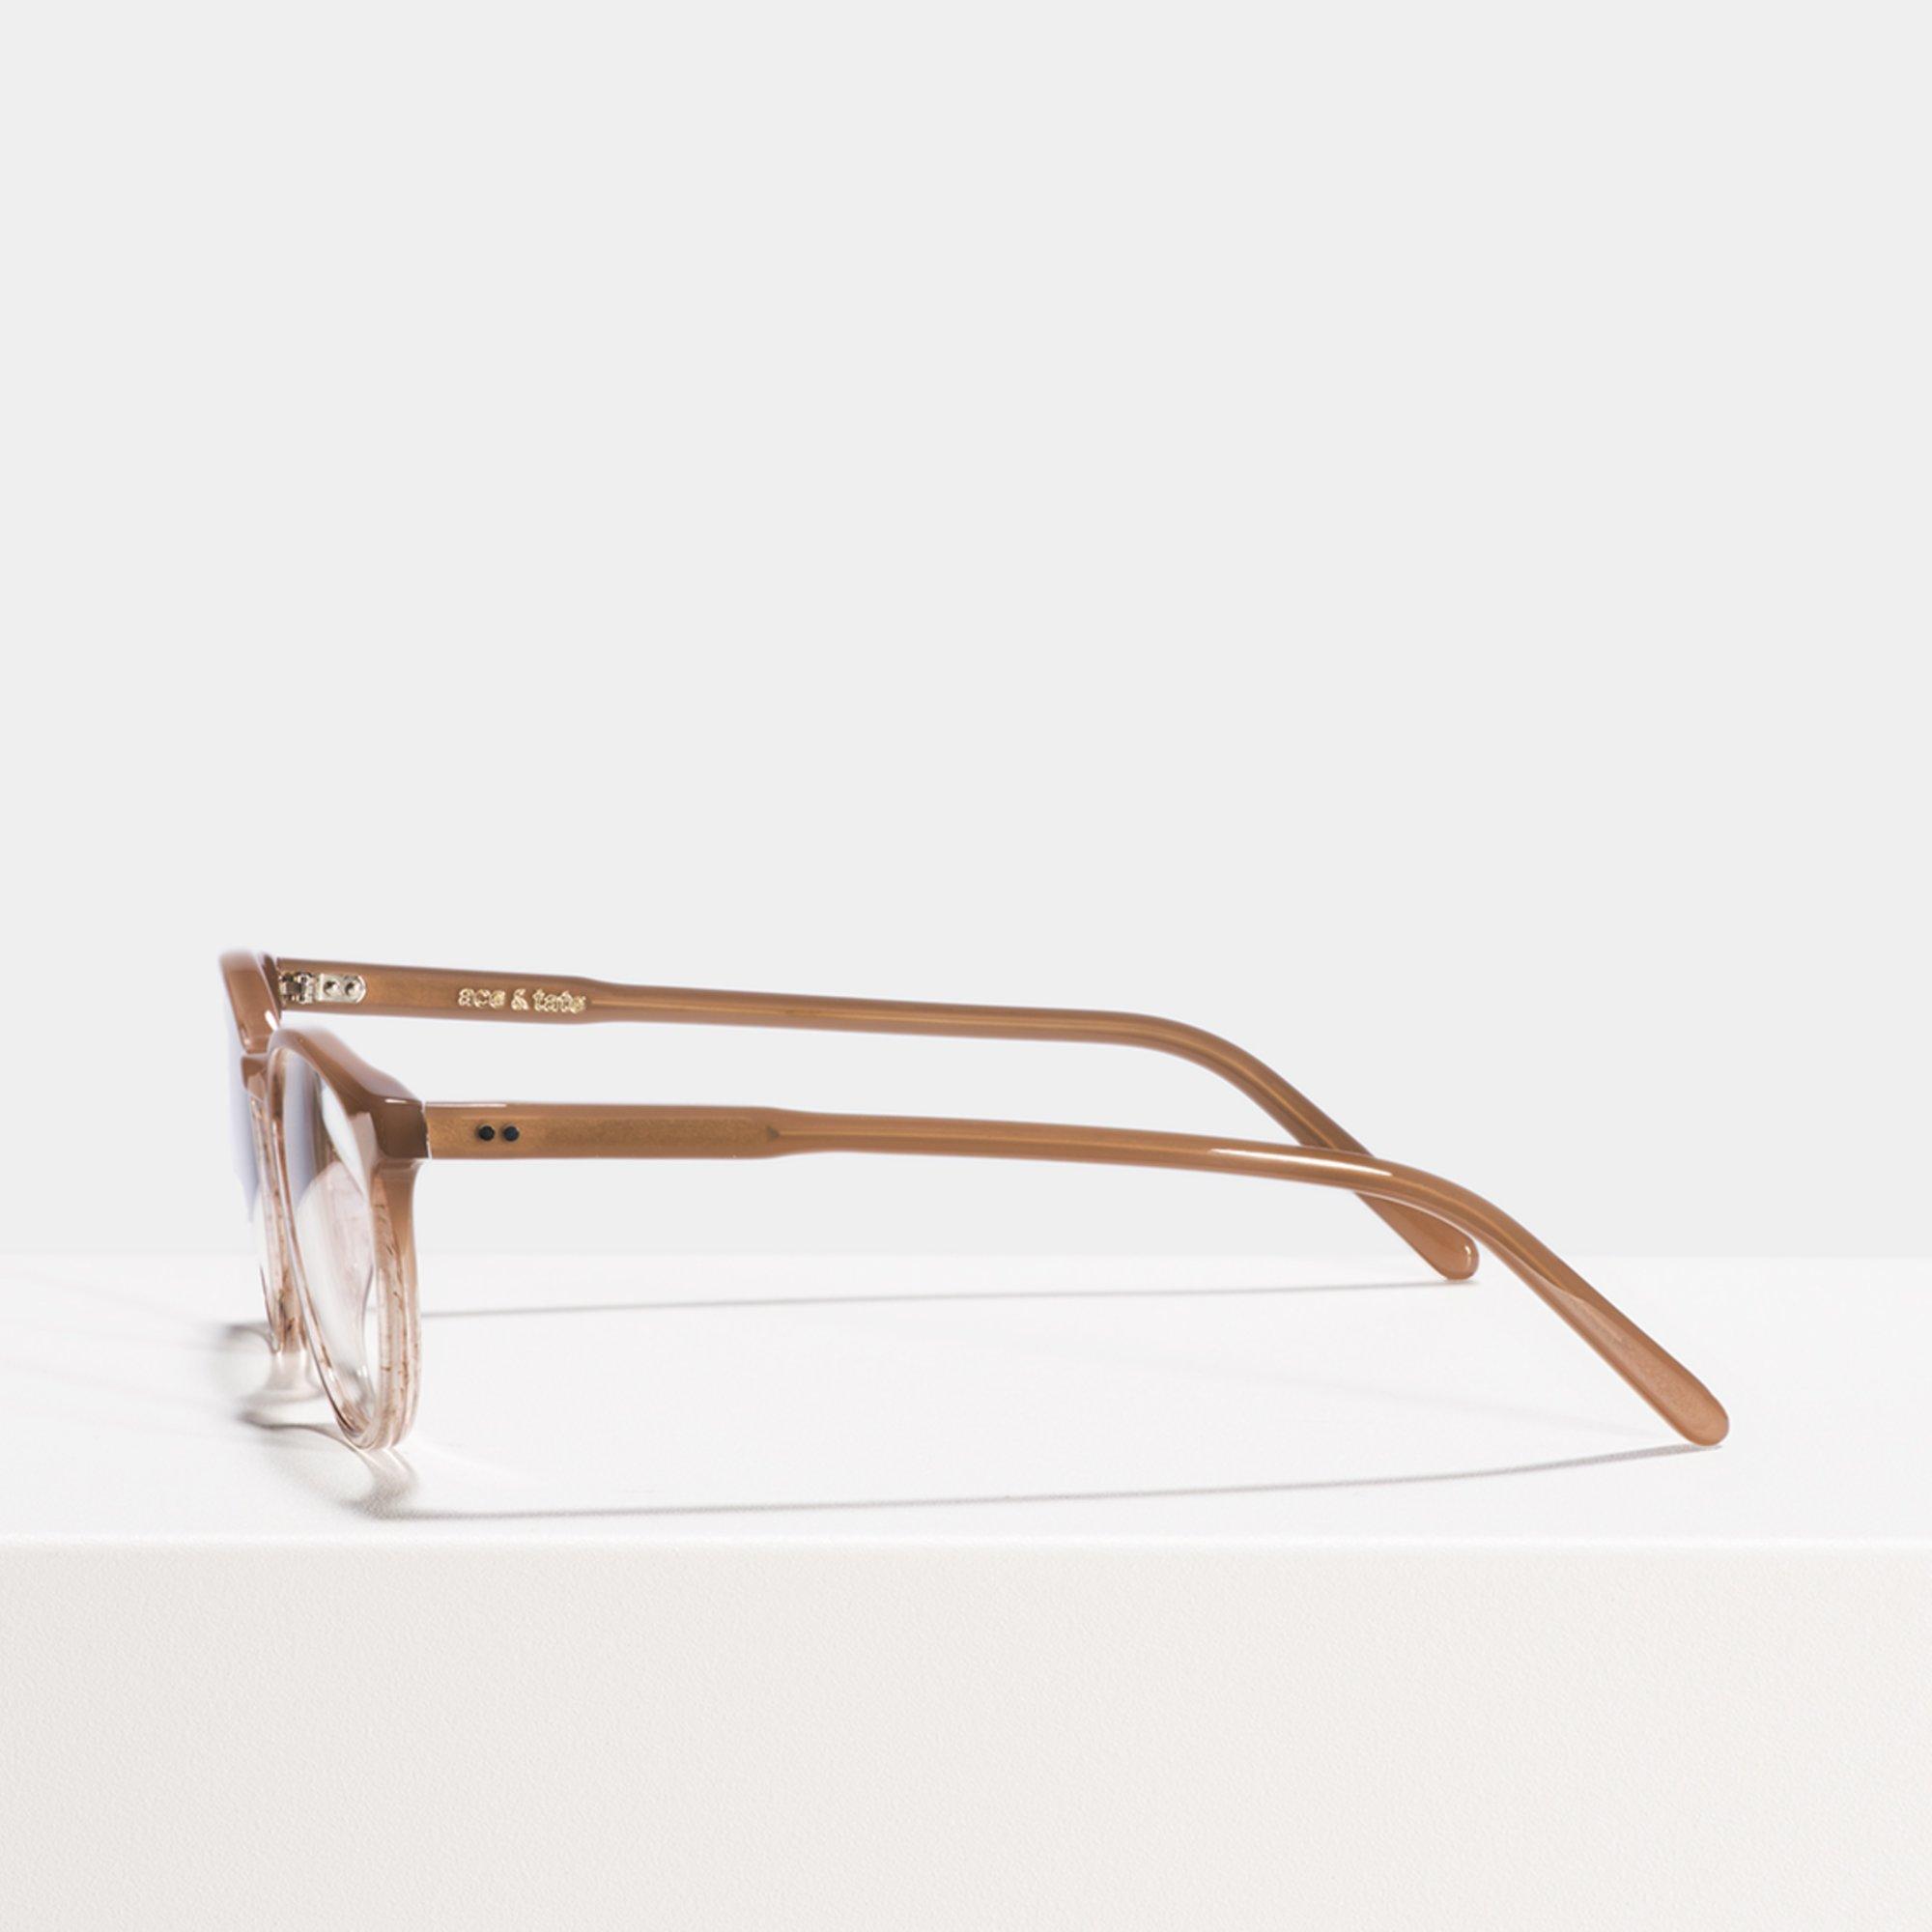 Ace & Tate Glasses    Acetat in Beige, Pink